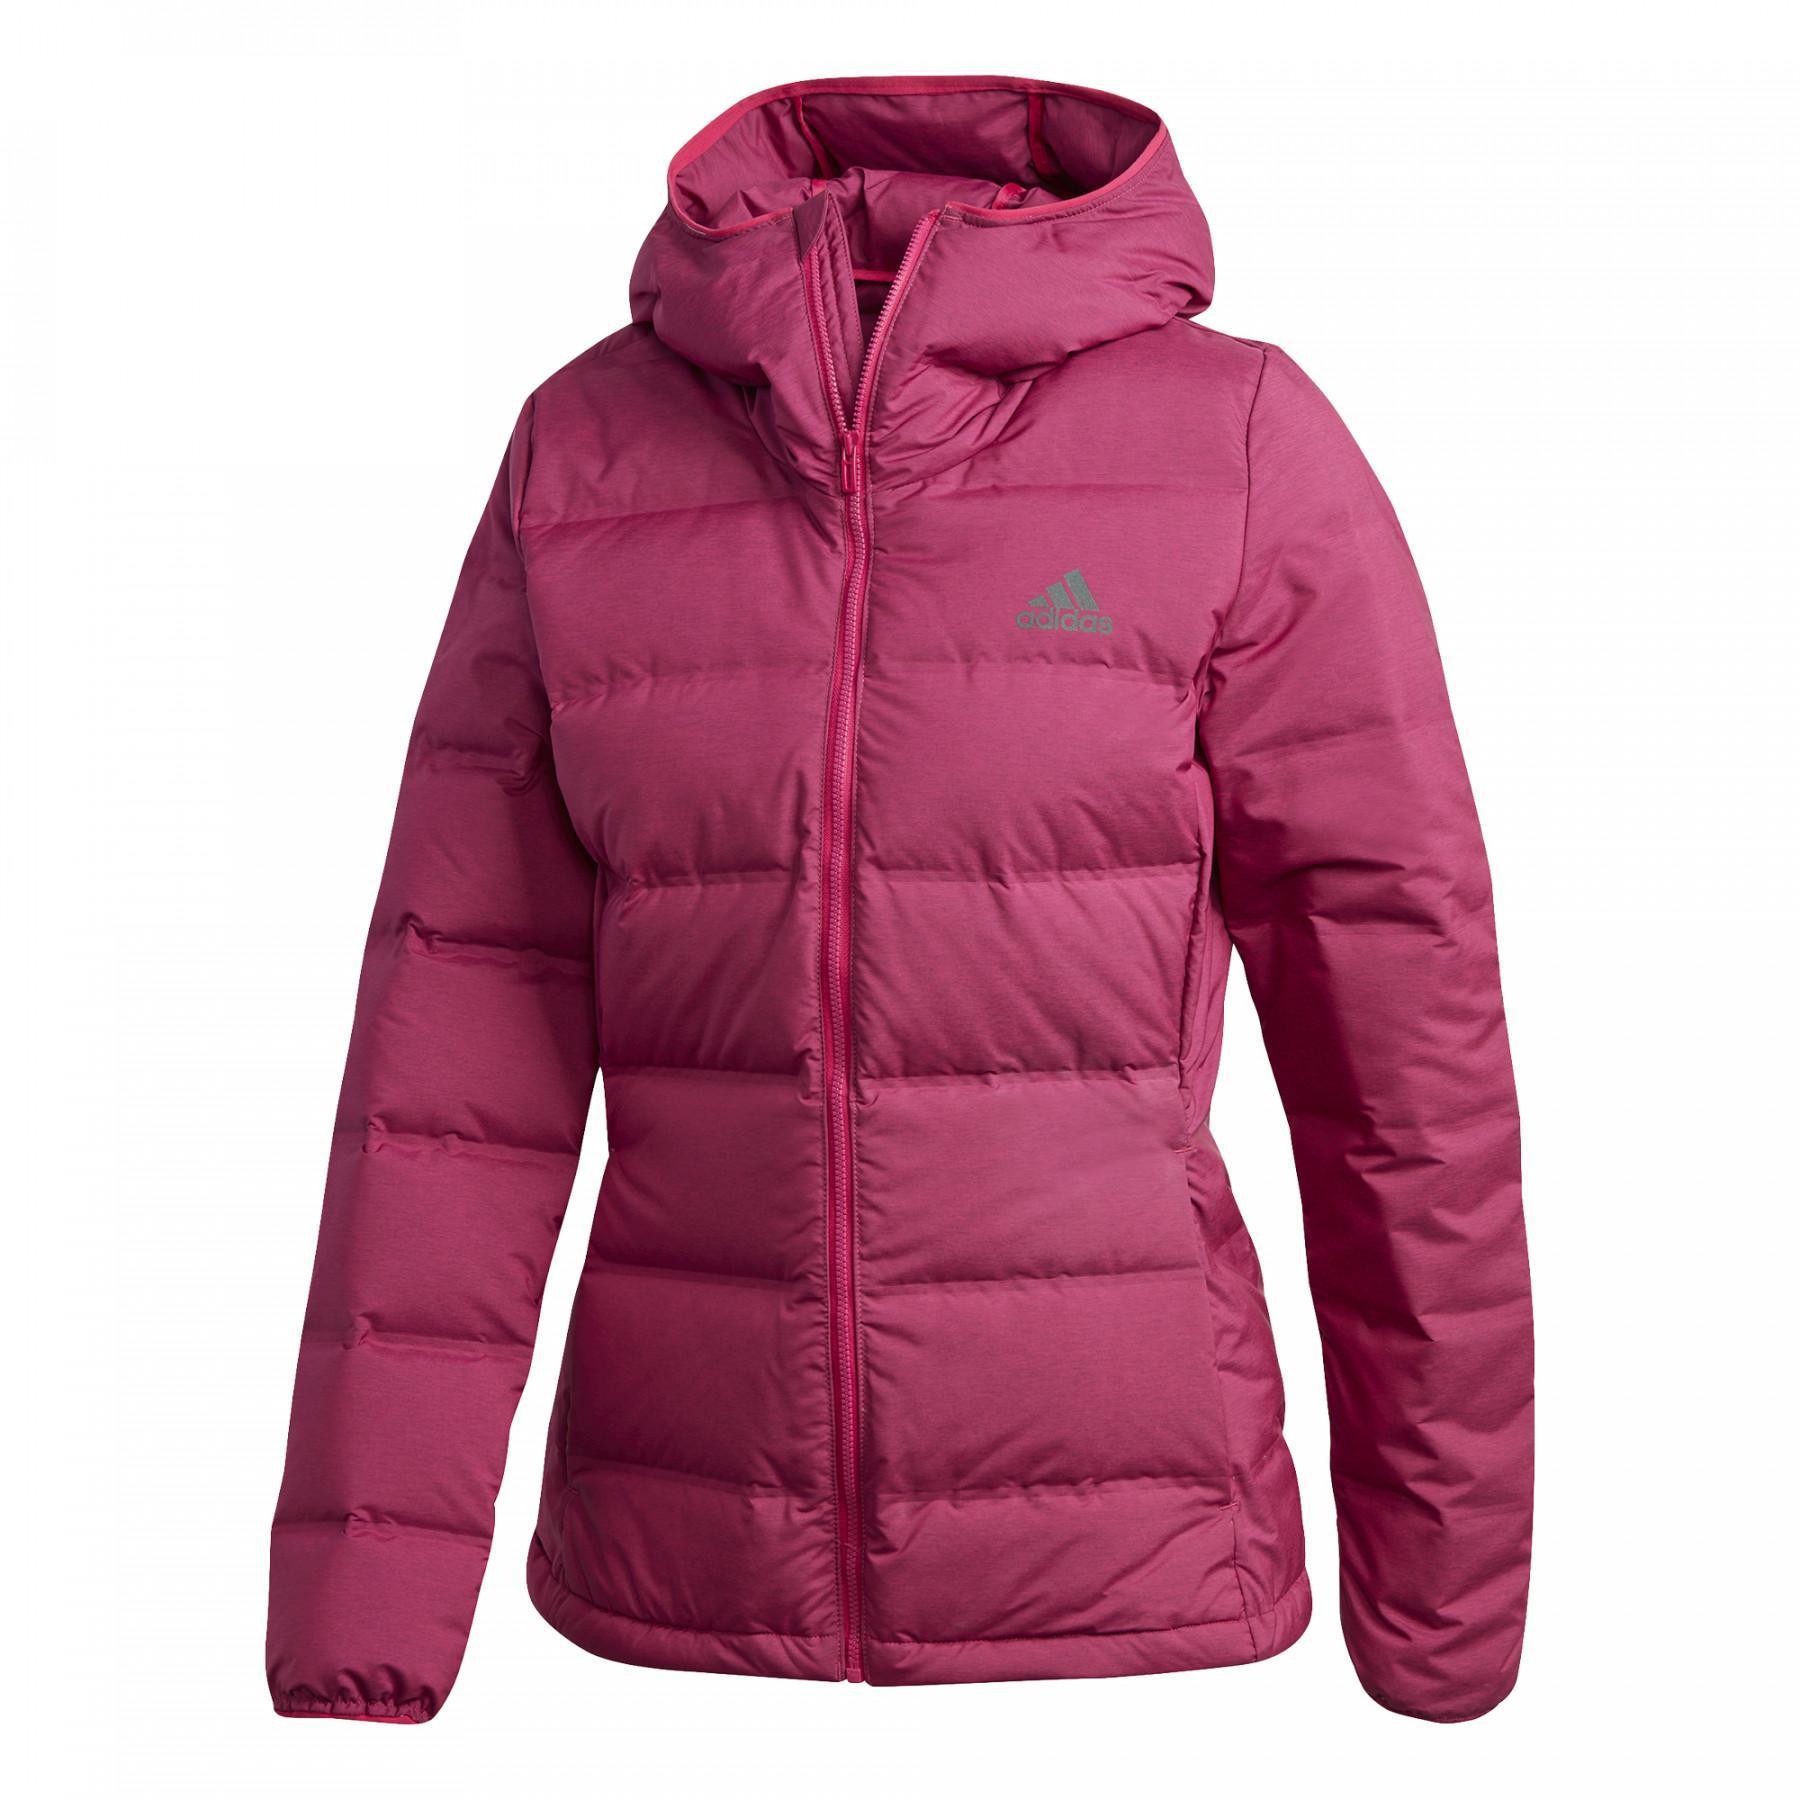 Adidas jacket woman Helionic Down